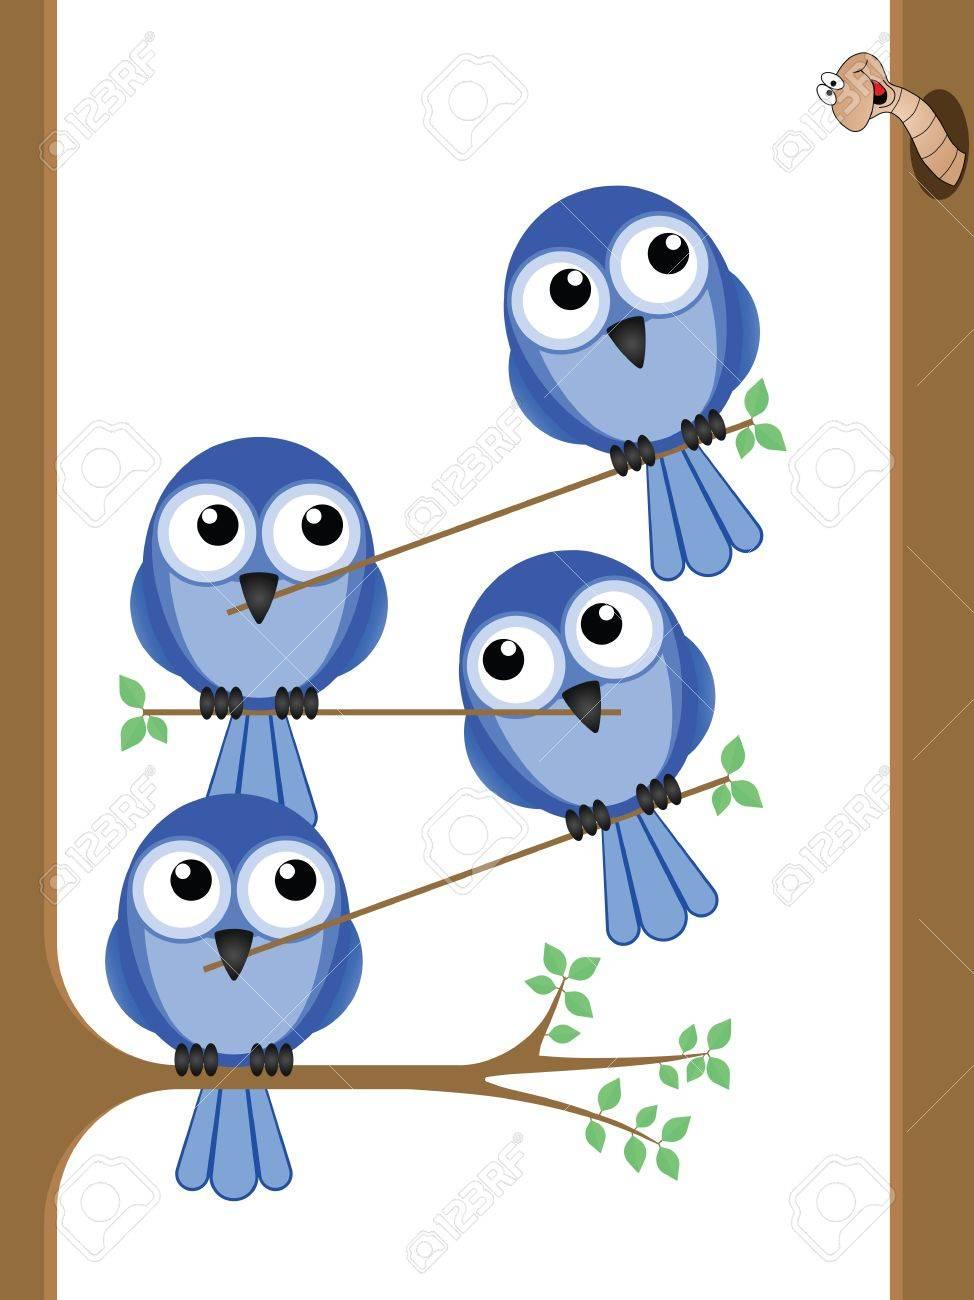 Bird teamwork to reach a worm for their lunch Stock Vector - 12197141